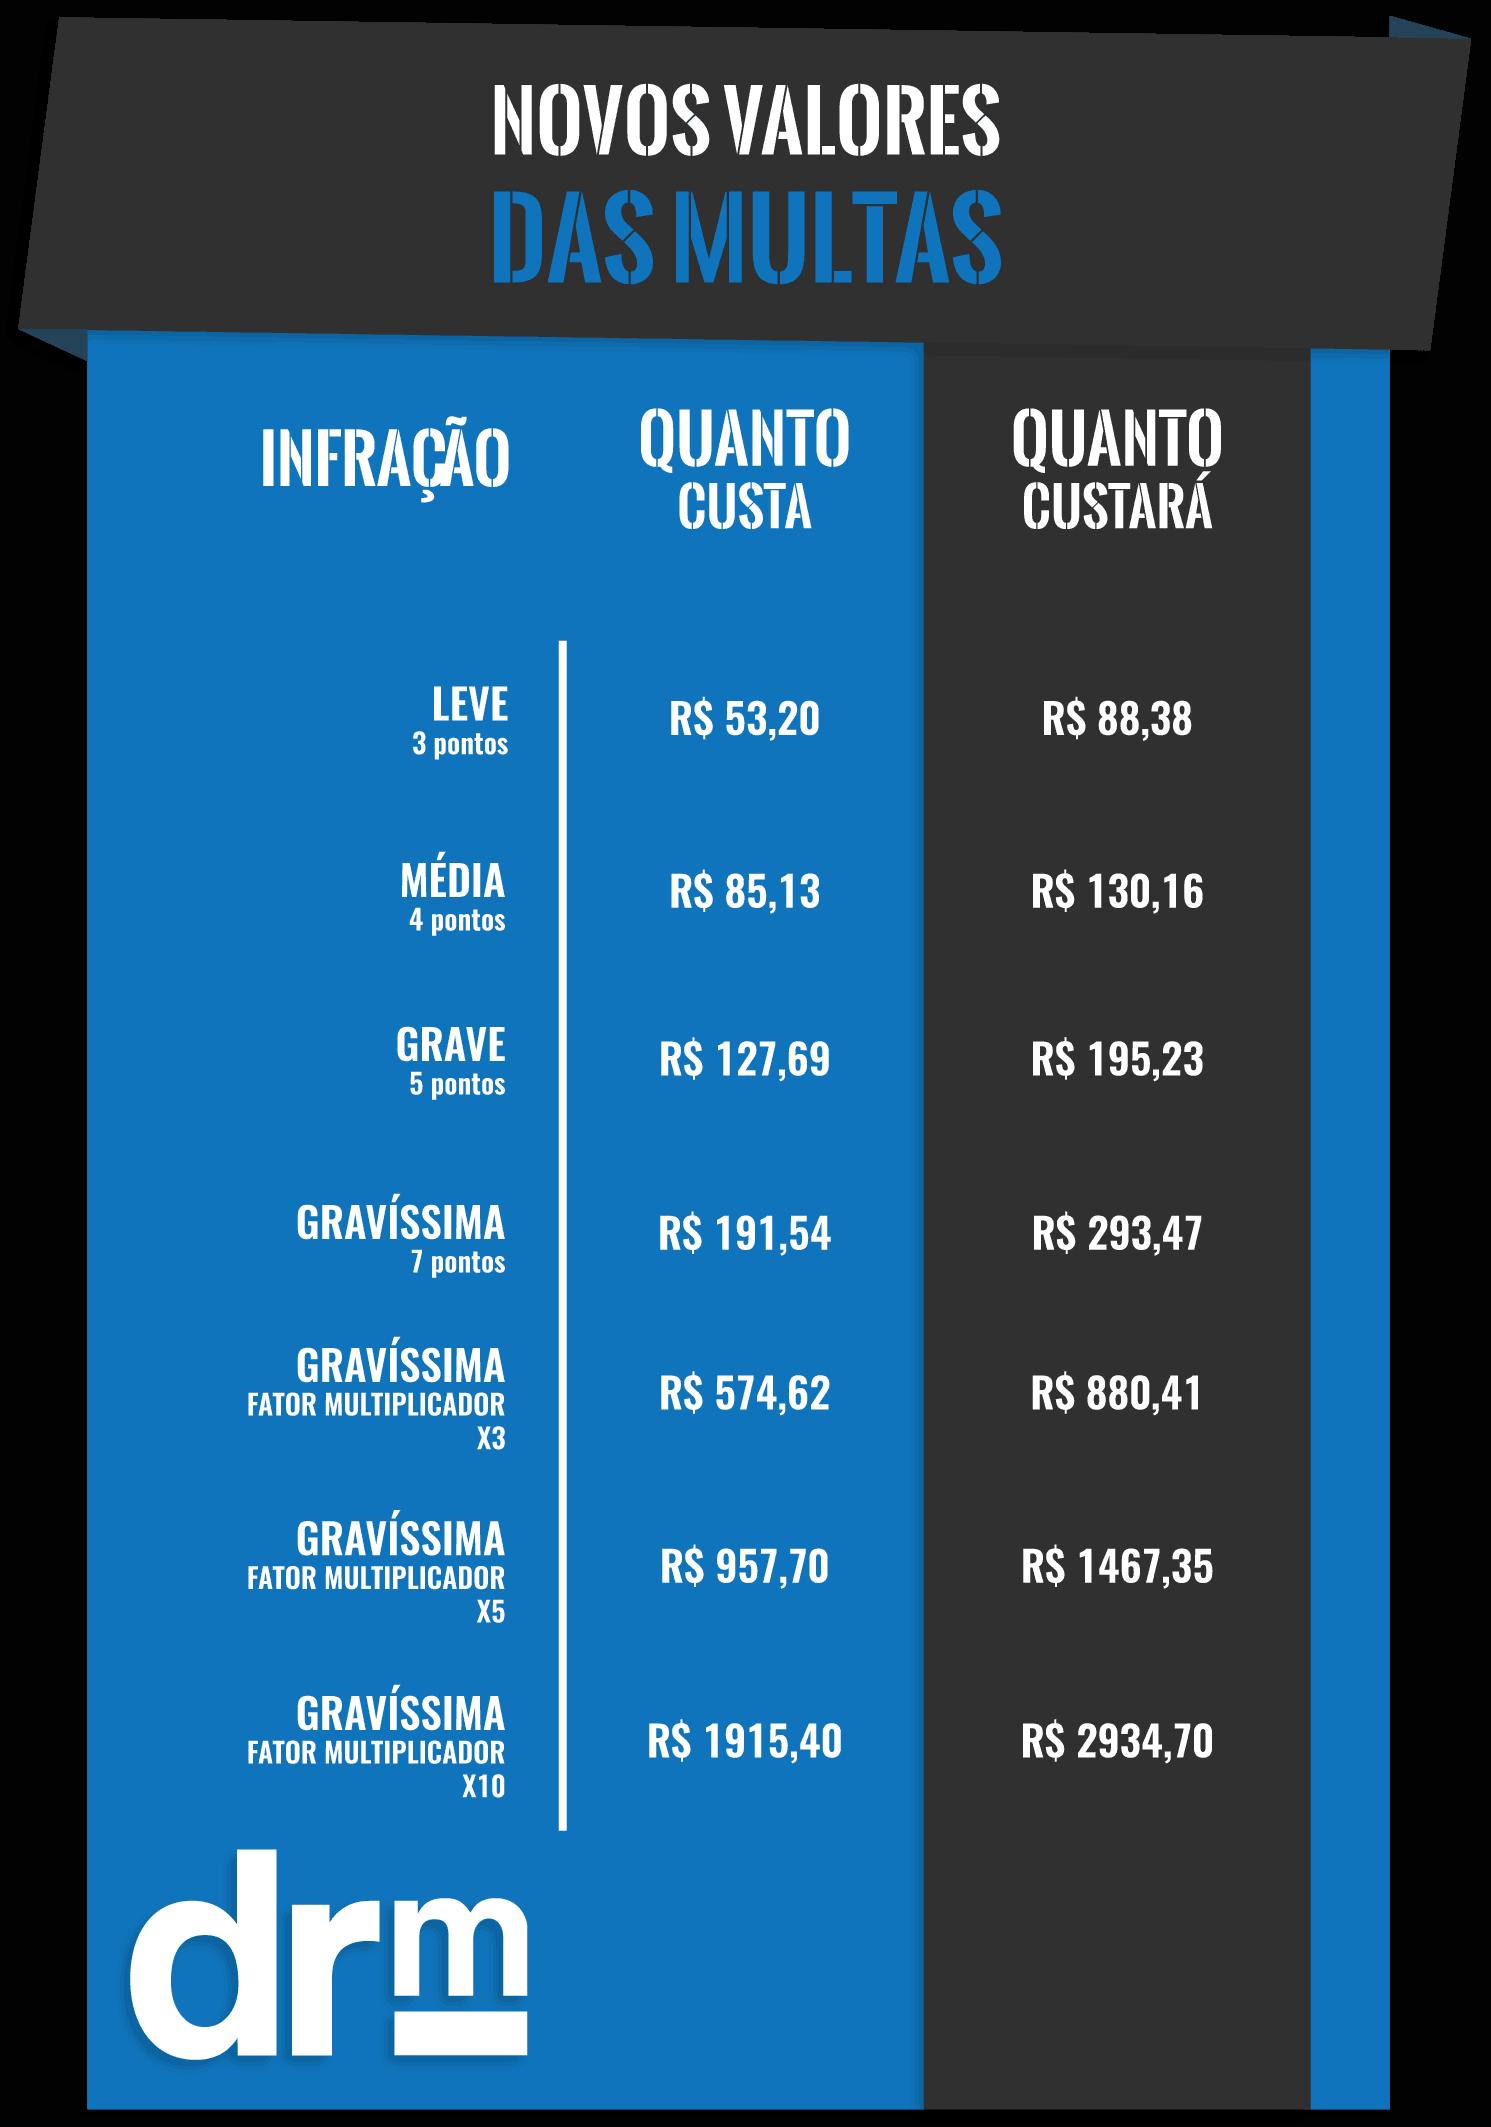 tabela-novos-valores-das-multas